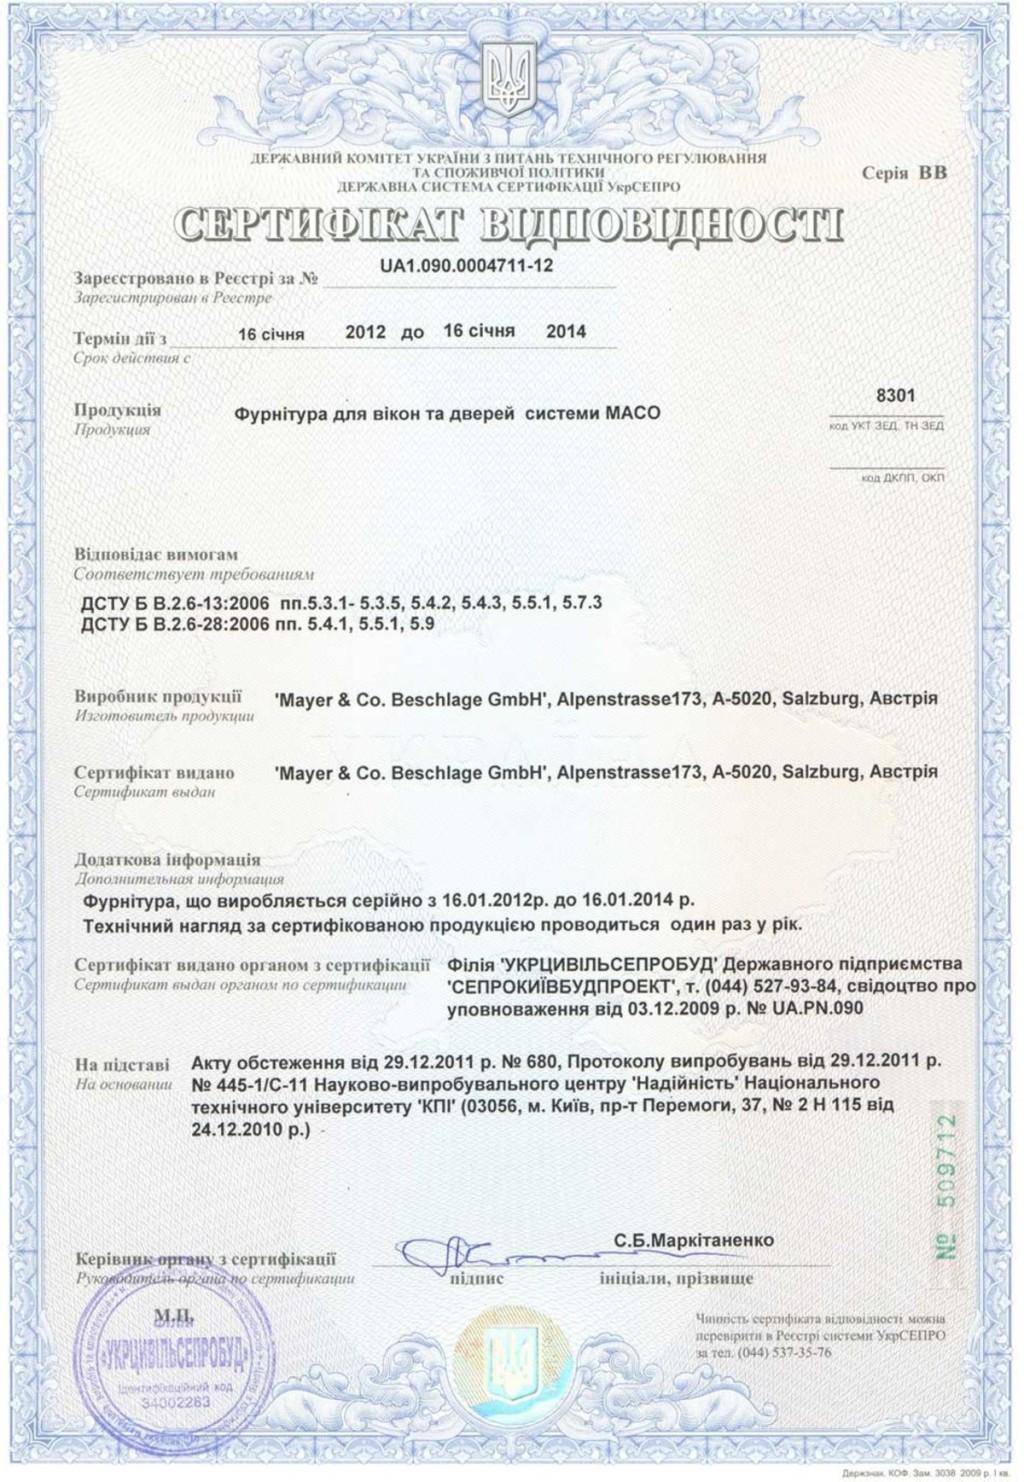 Сертификат соответствия на фурнитуру MACO